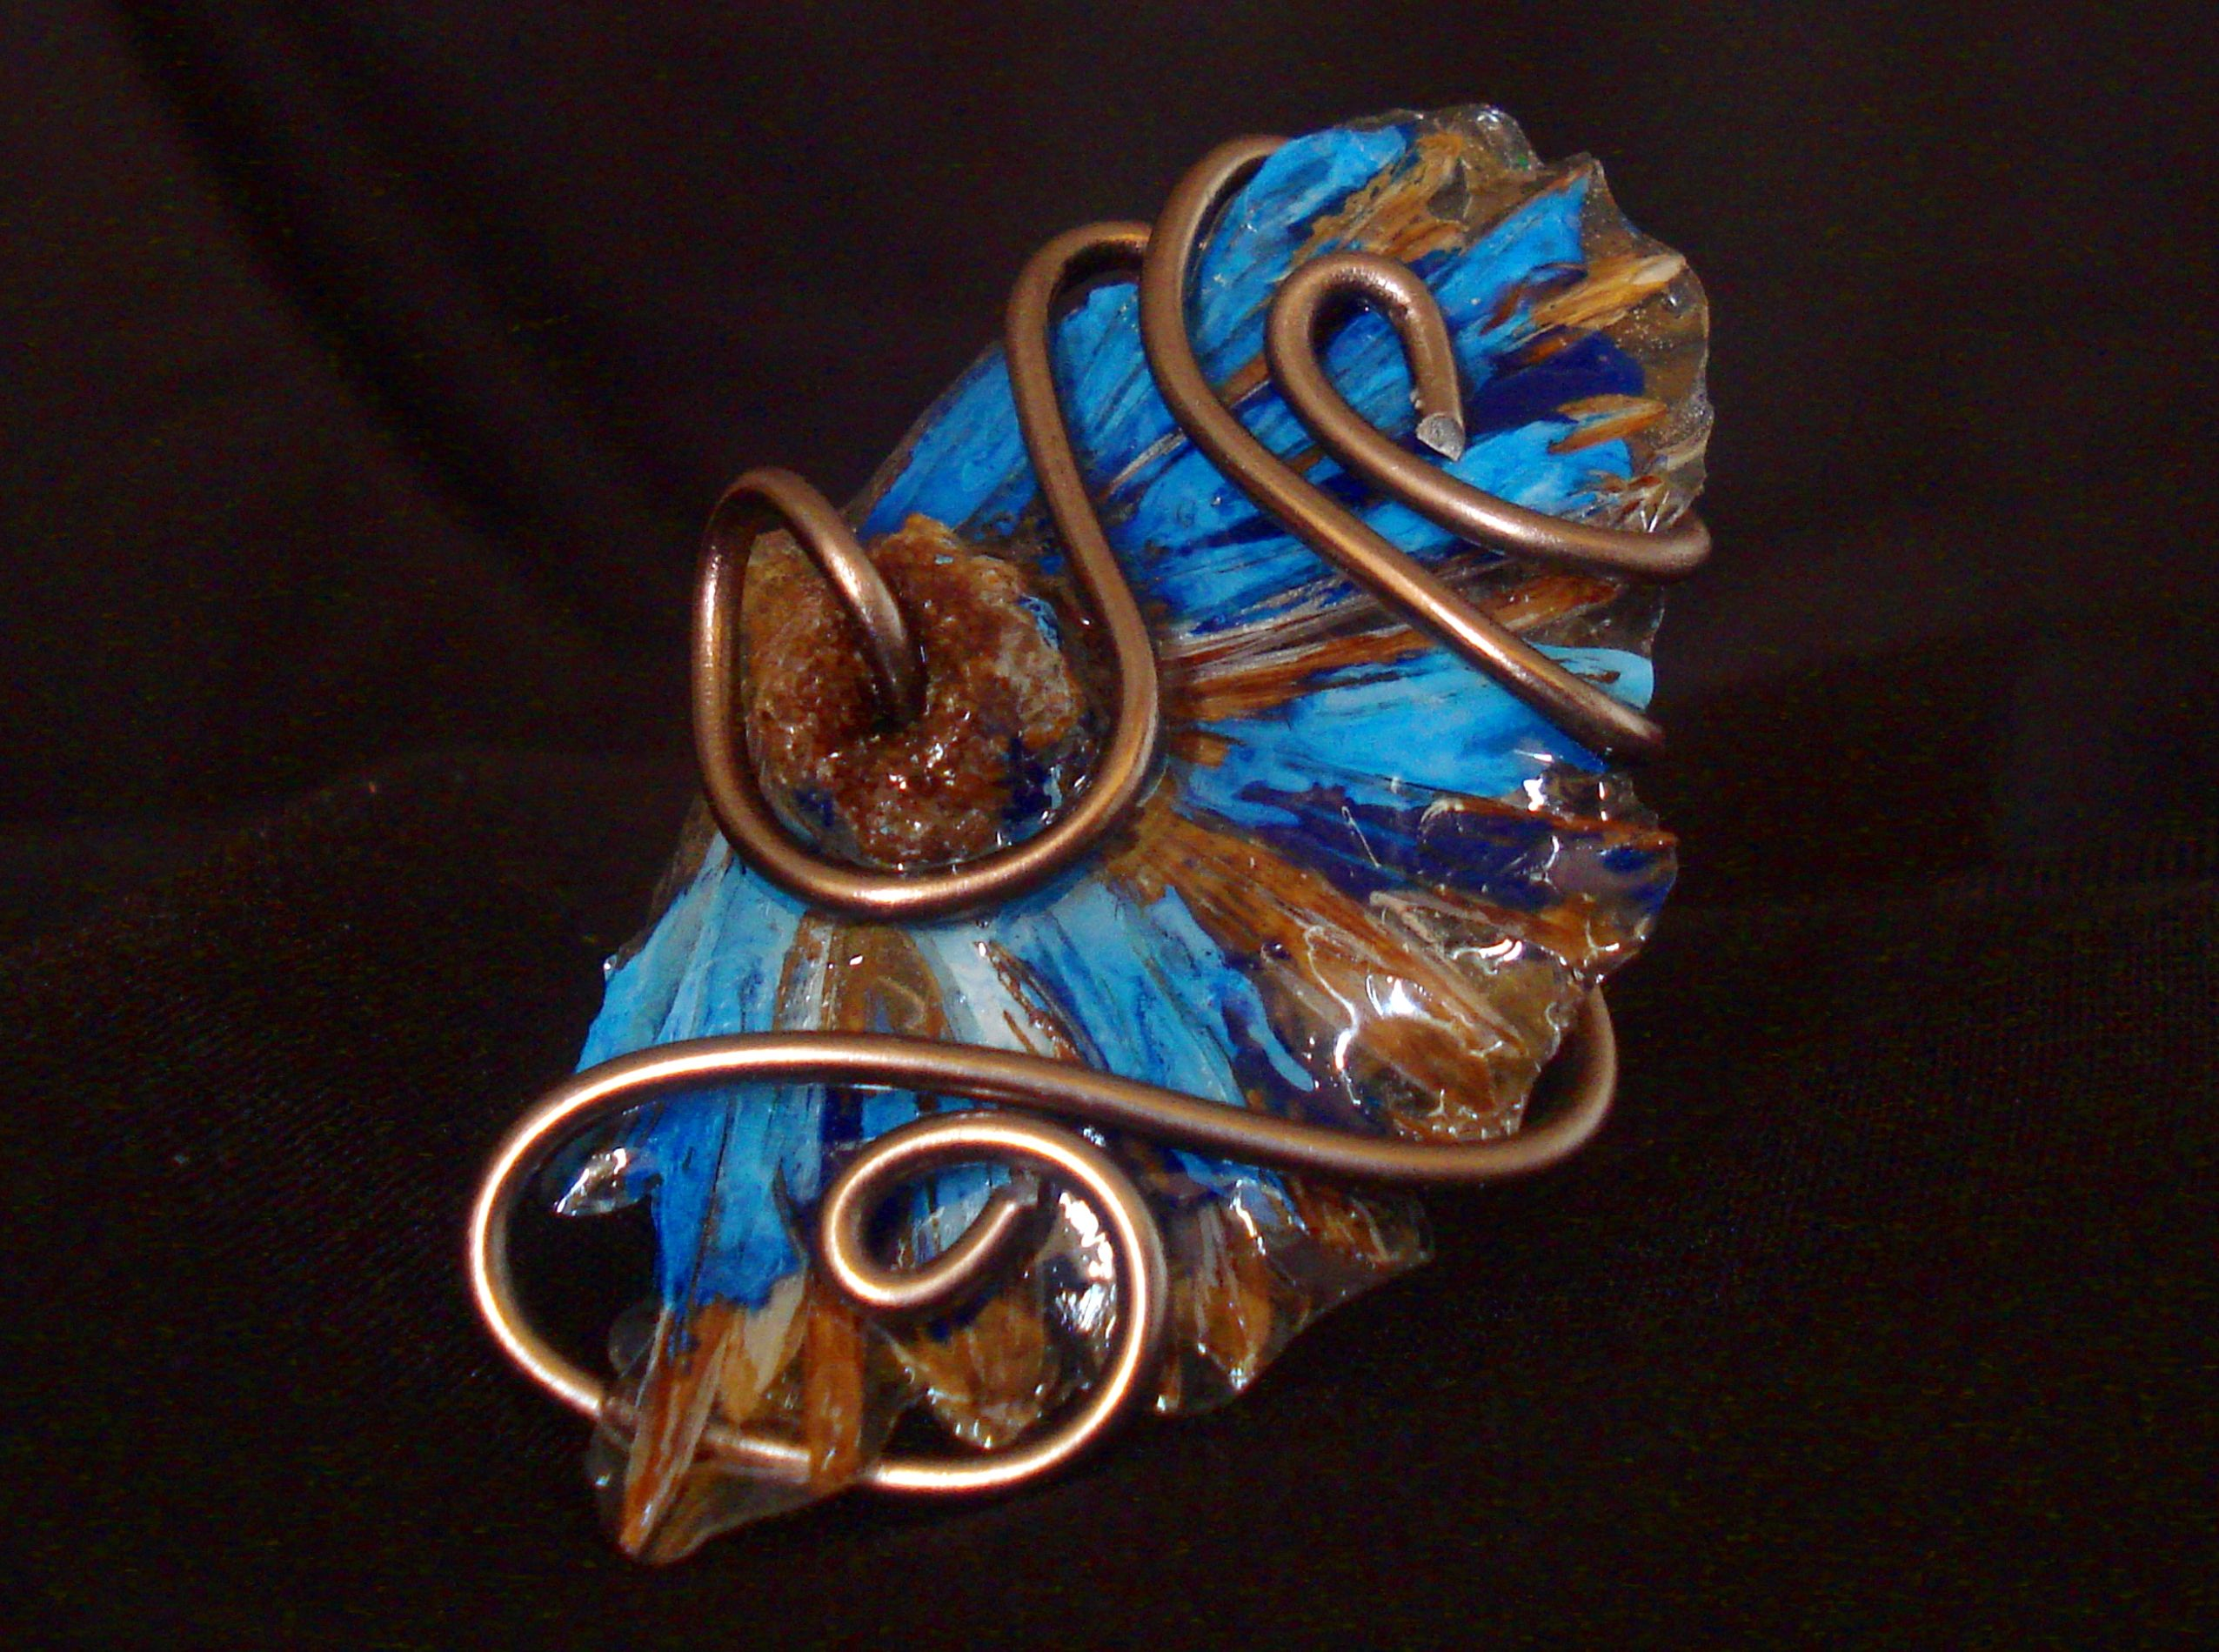 Anel Margarida Azul * Blue Daisy Ring * Fashion * Jewelry